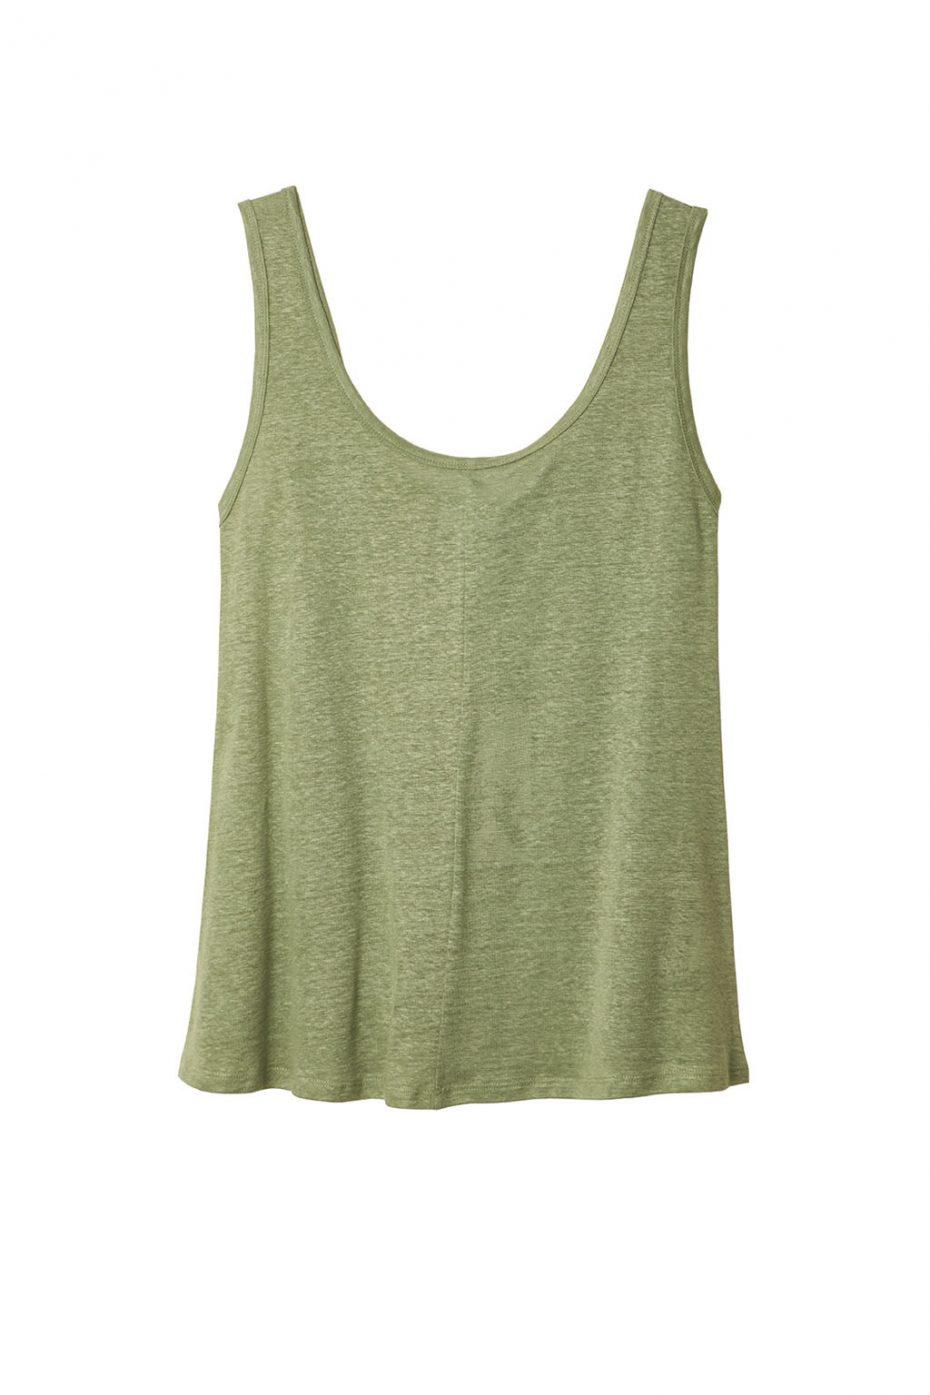 Camiseta Tirantes Lino Menta de Vandos